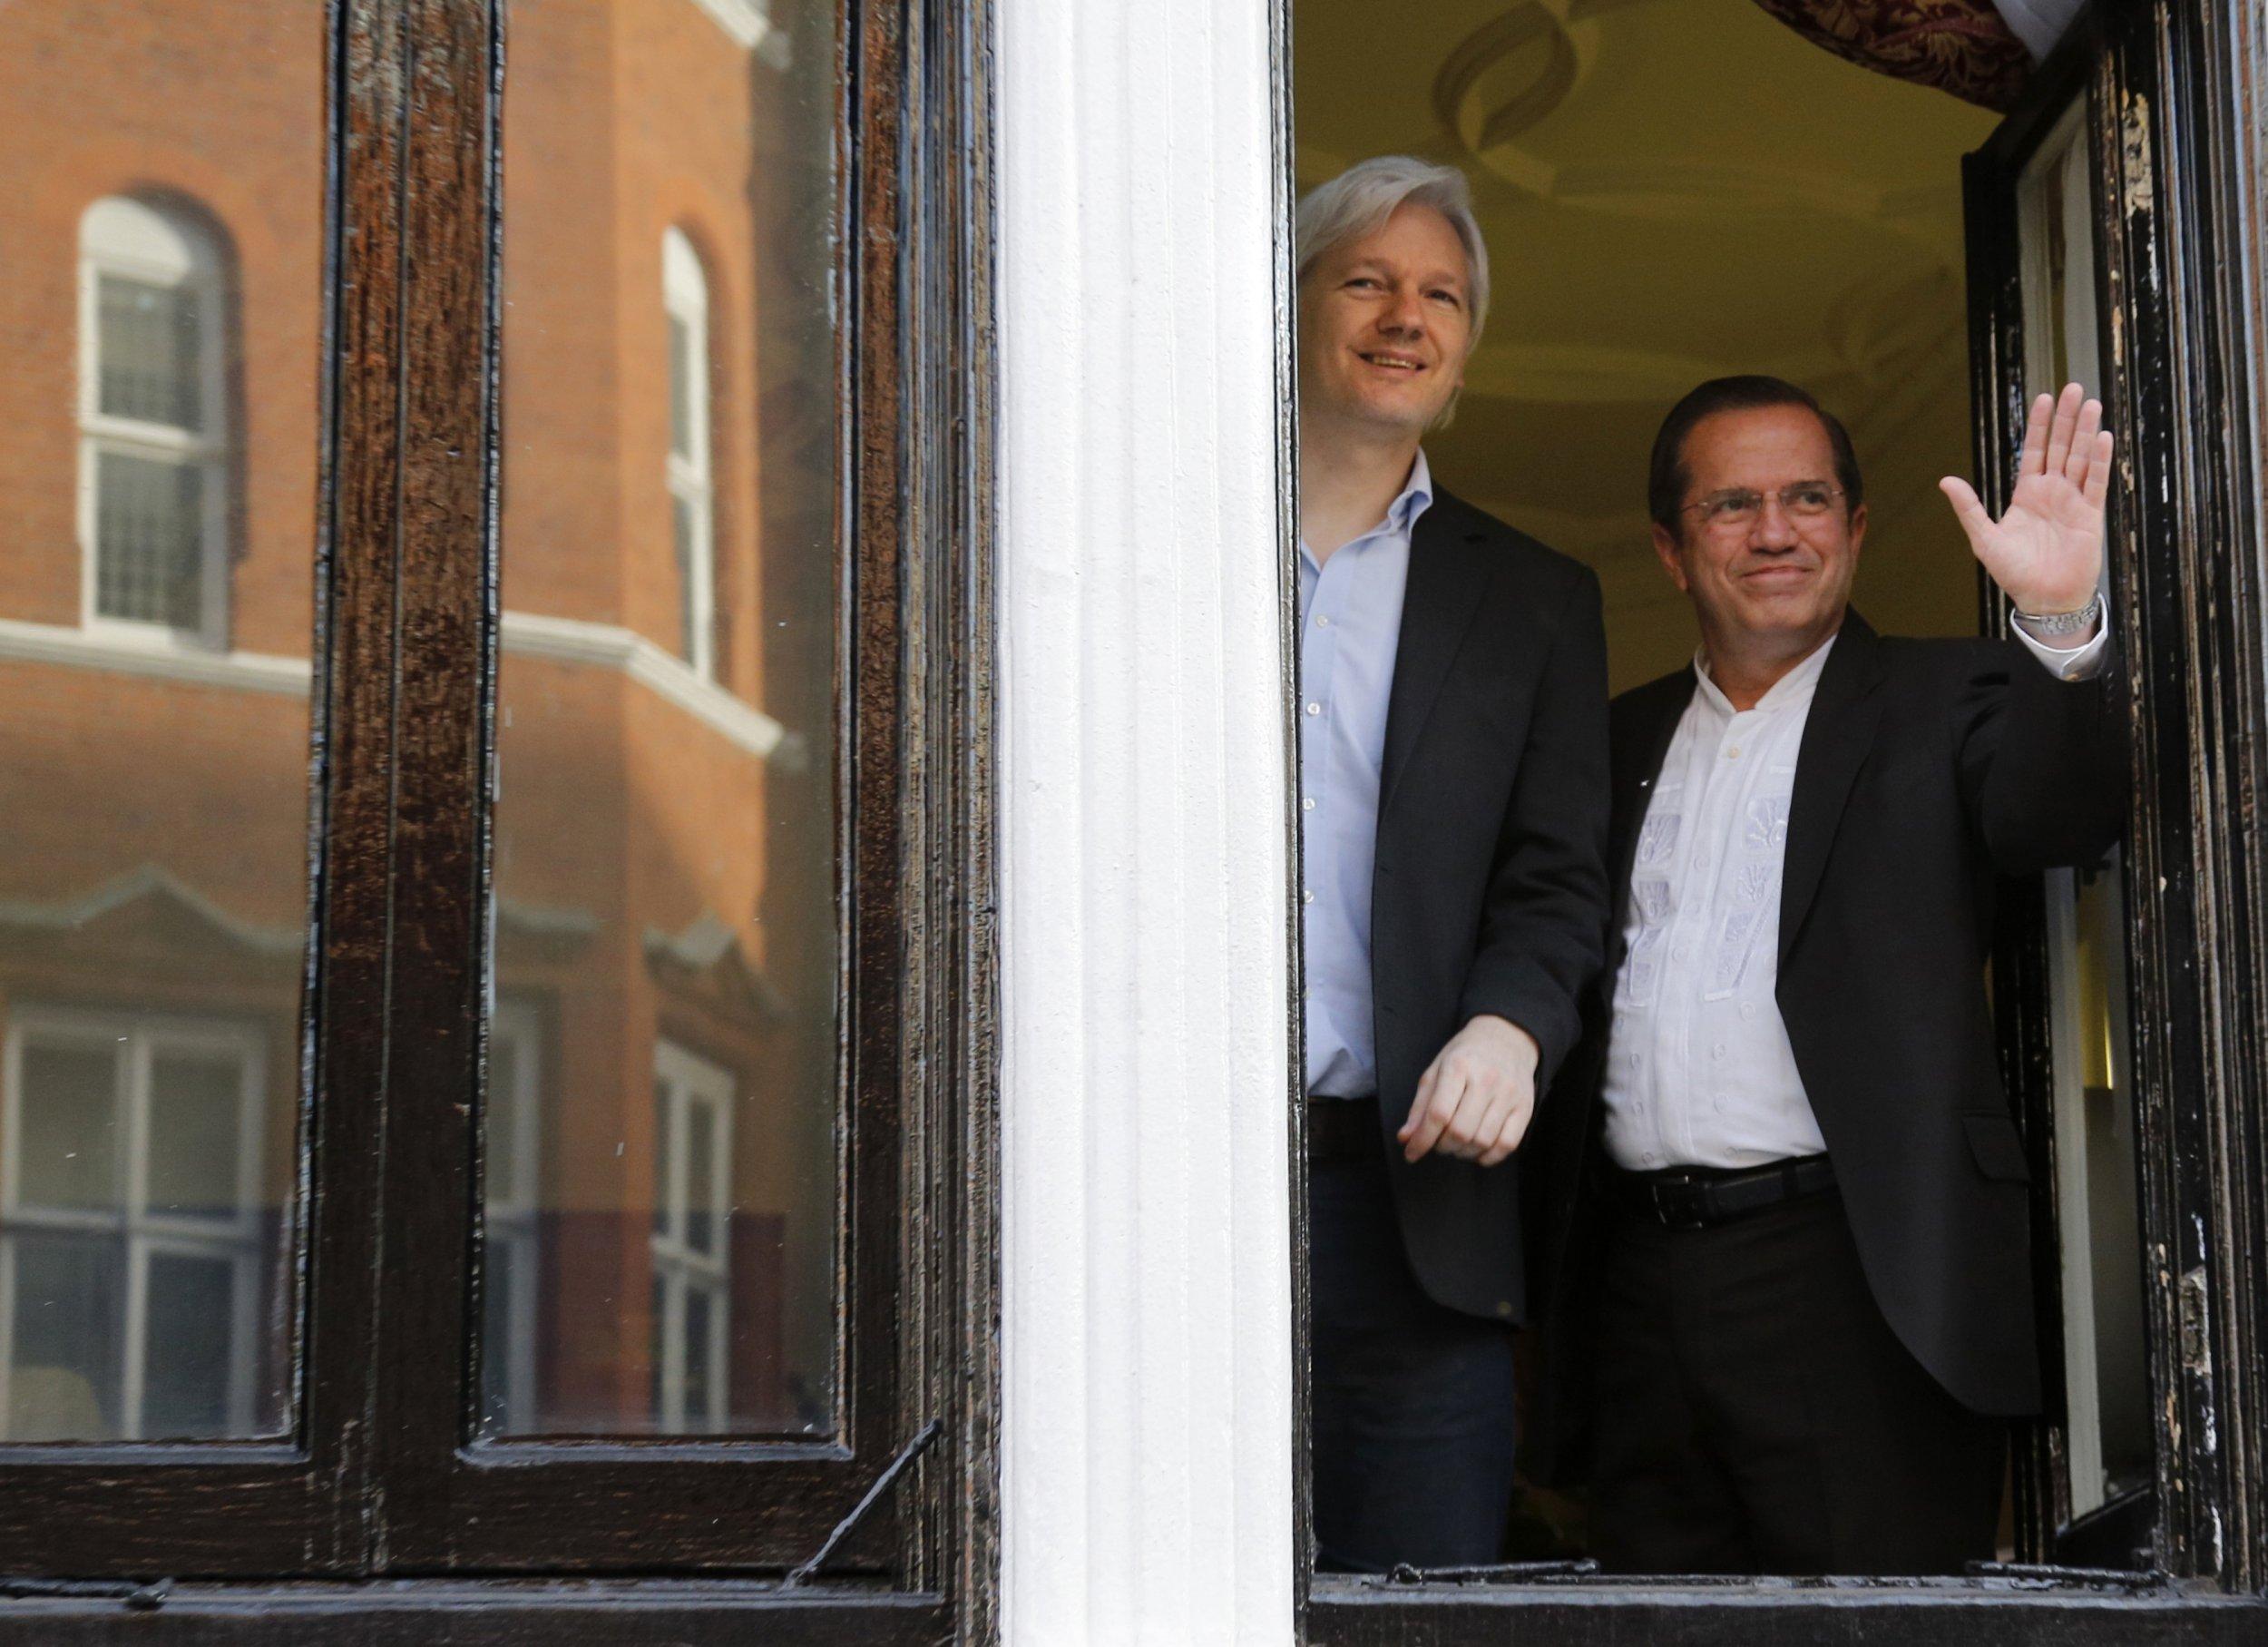 Julian Assange Wikileaks Ecuador embassy Patino sweden